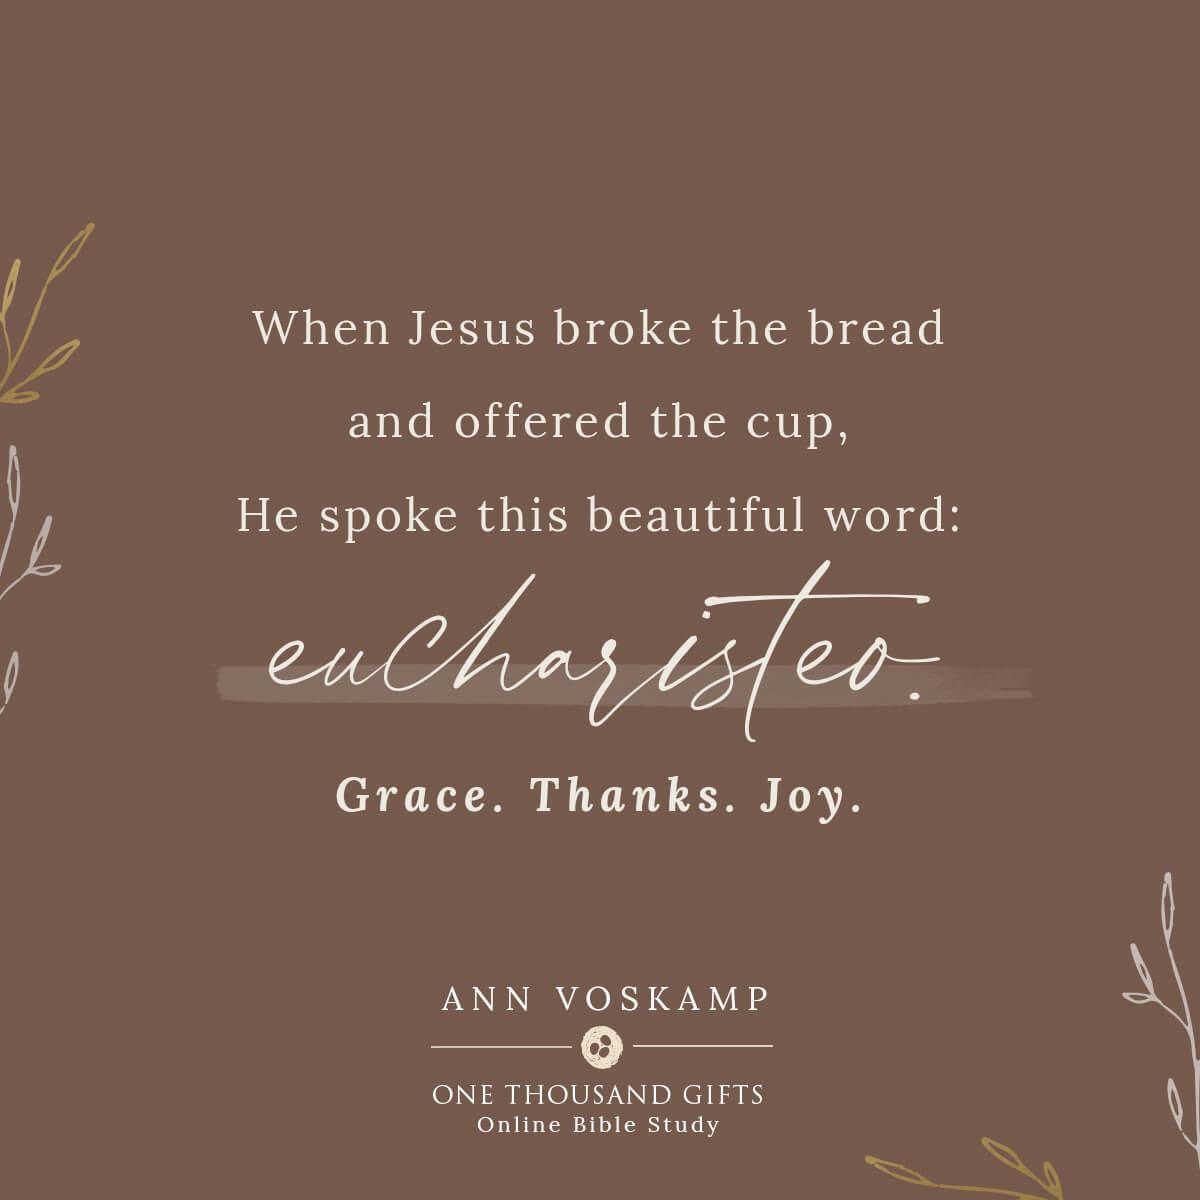 One Thousand Gifts Session 1 – Attitude of Gratitude /Ann Voskamp